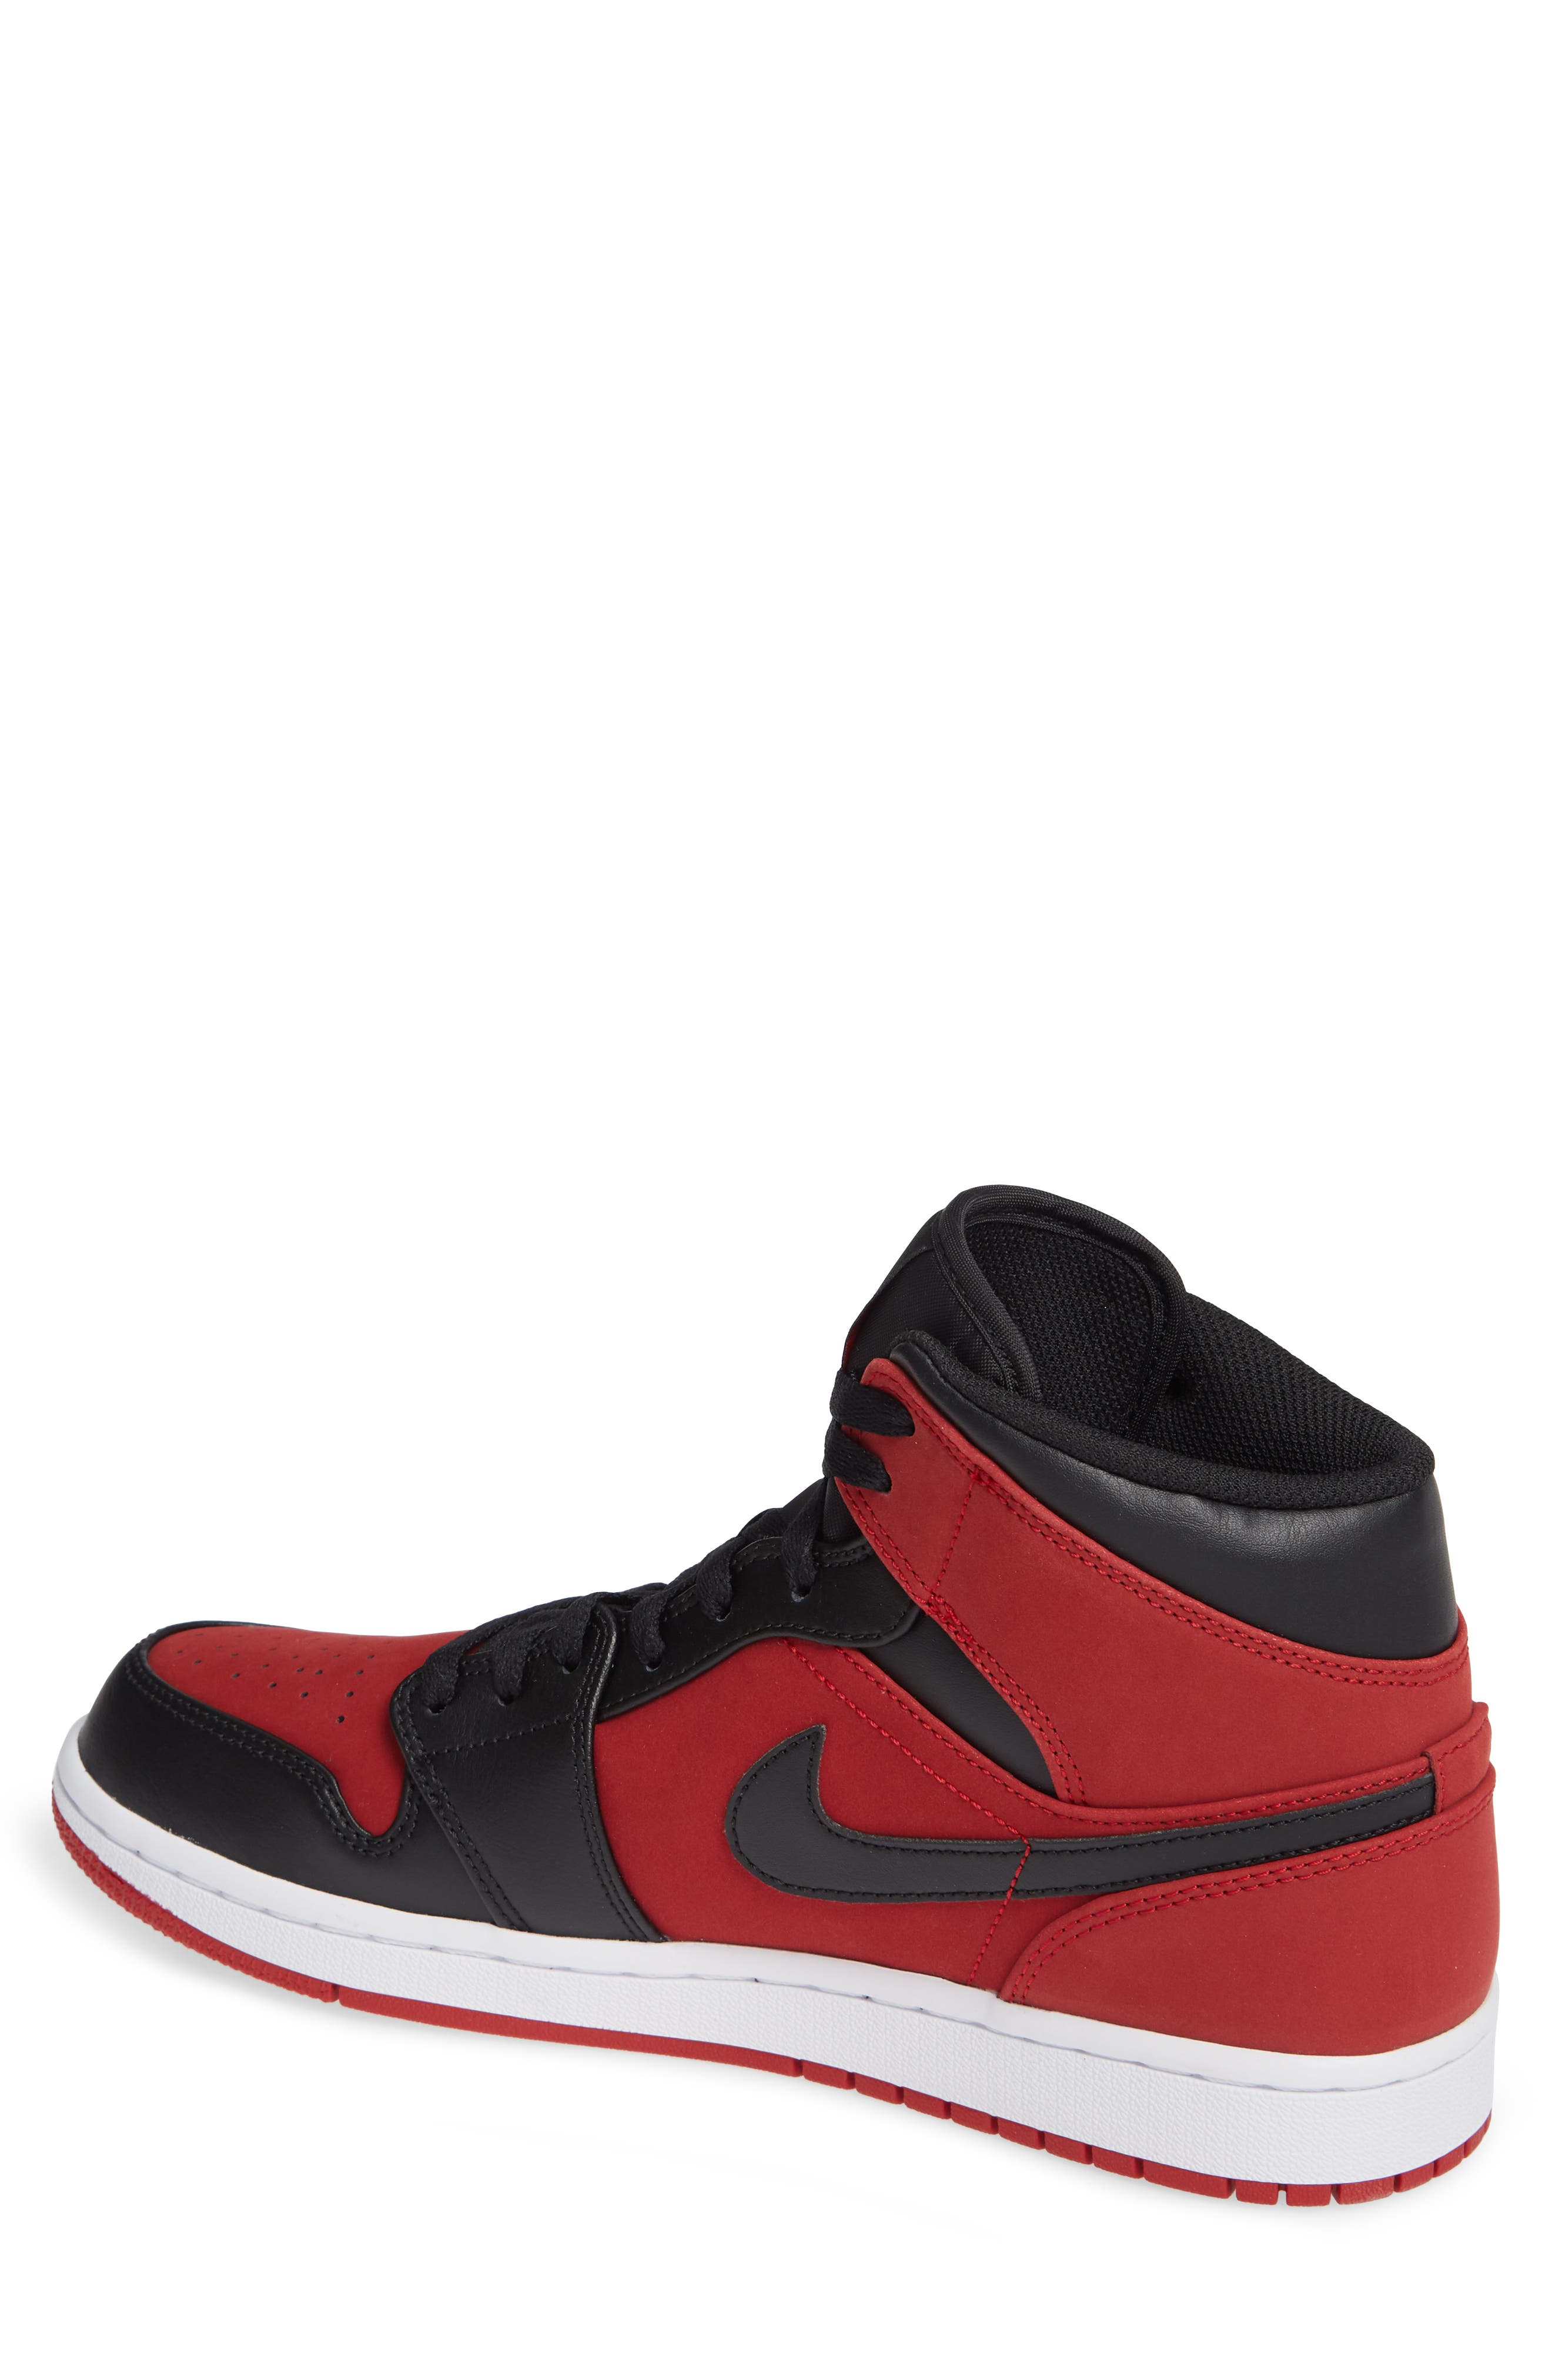 Menu0027s Nike Shoes Nordstrom